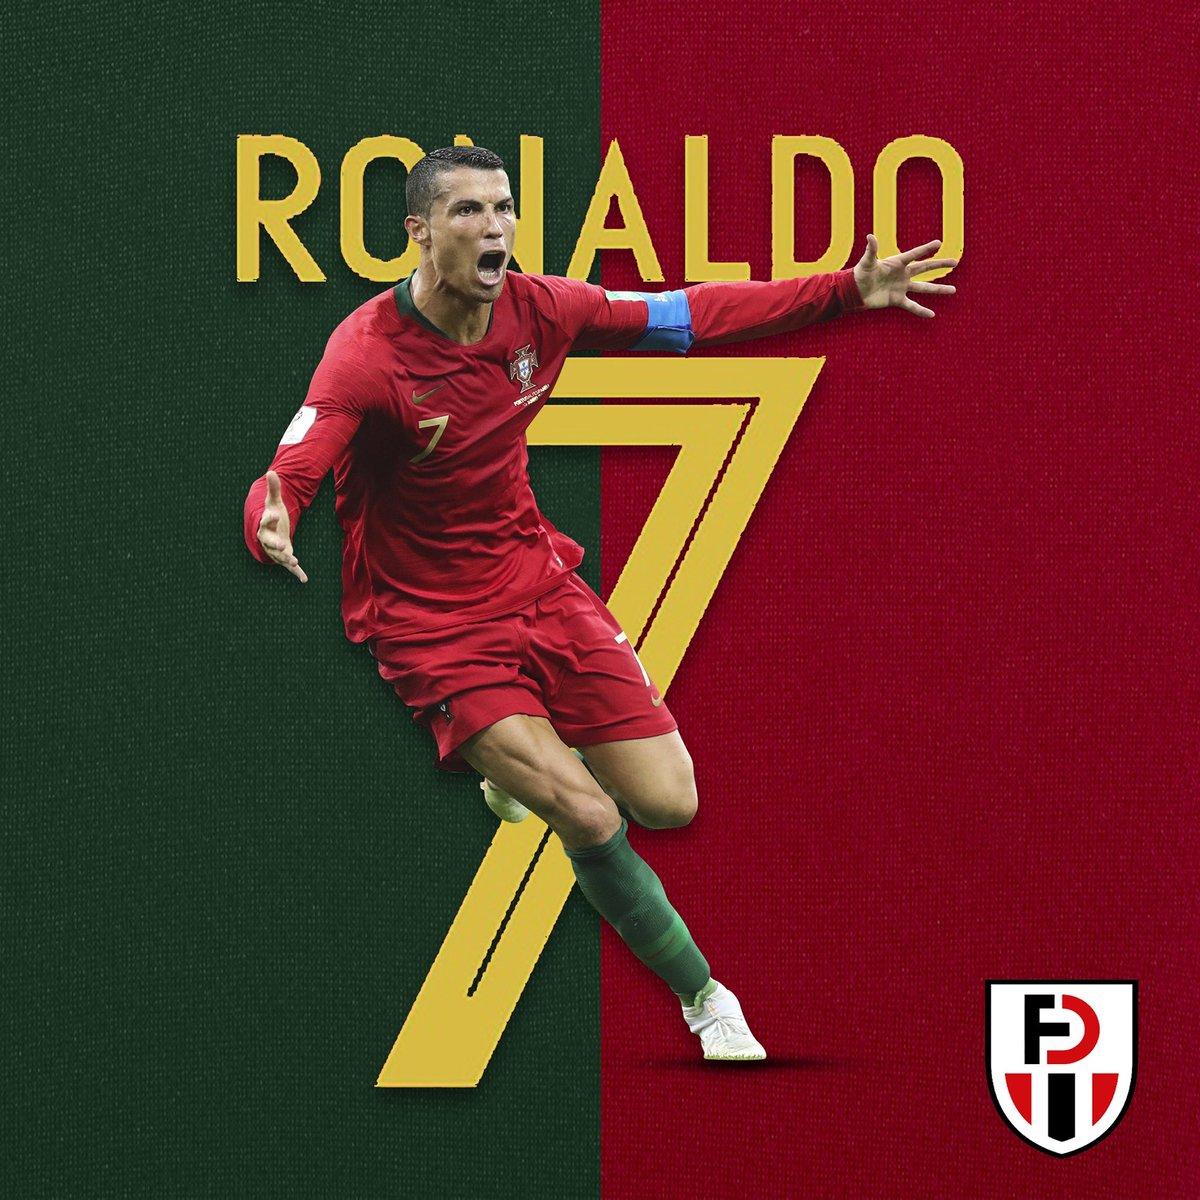 Digital Jerseys A Twitter Cr7 Ronaldo Cristianoronaldo